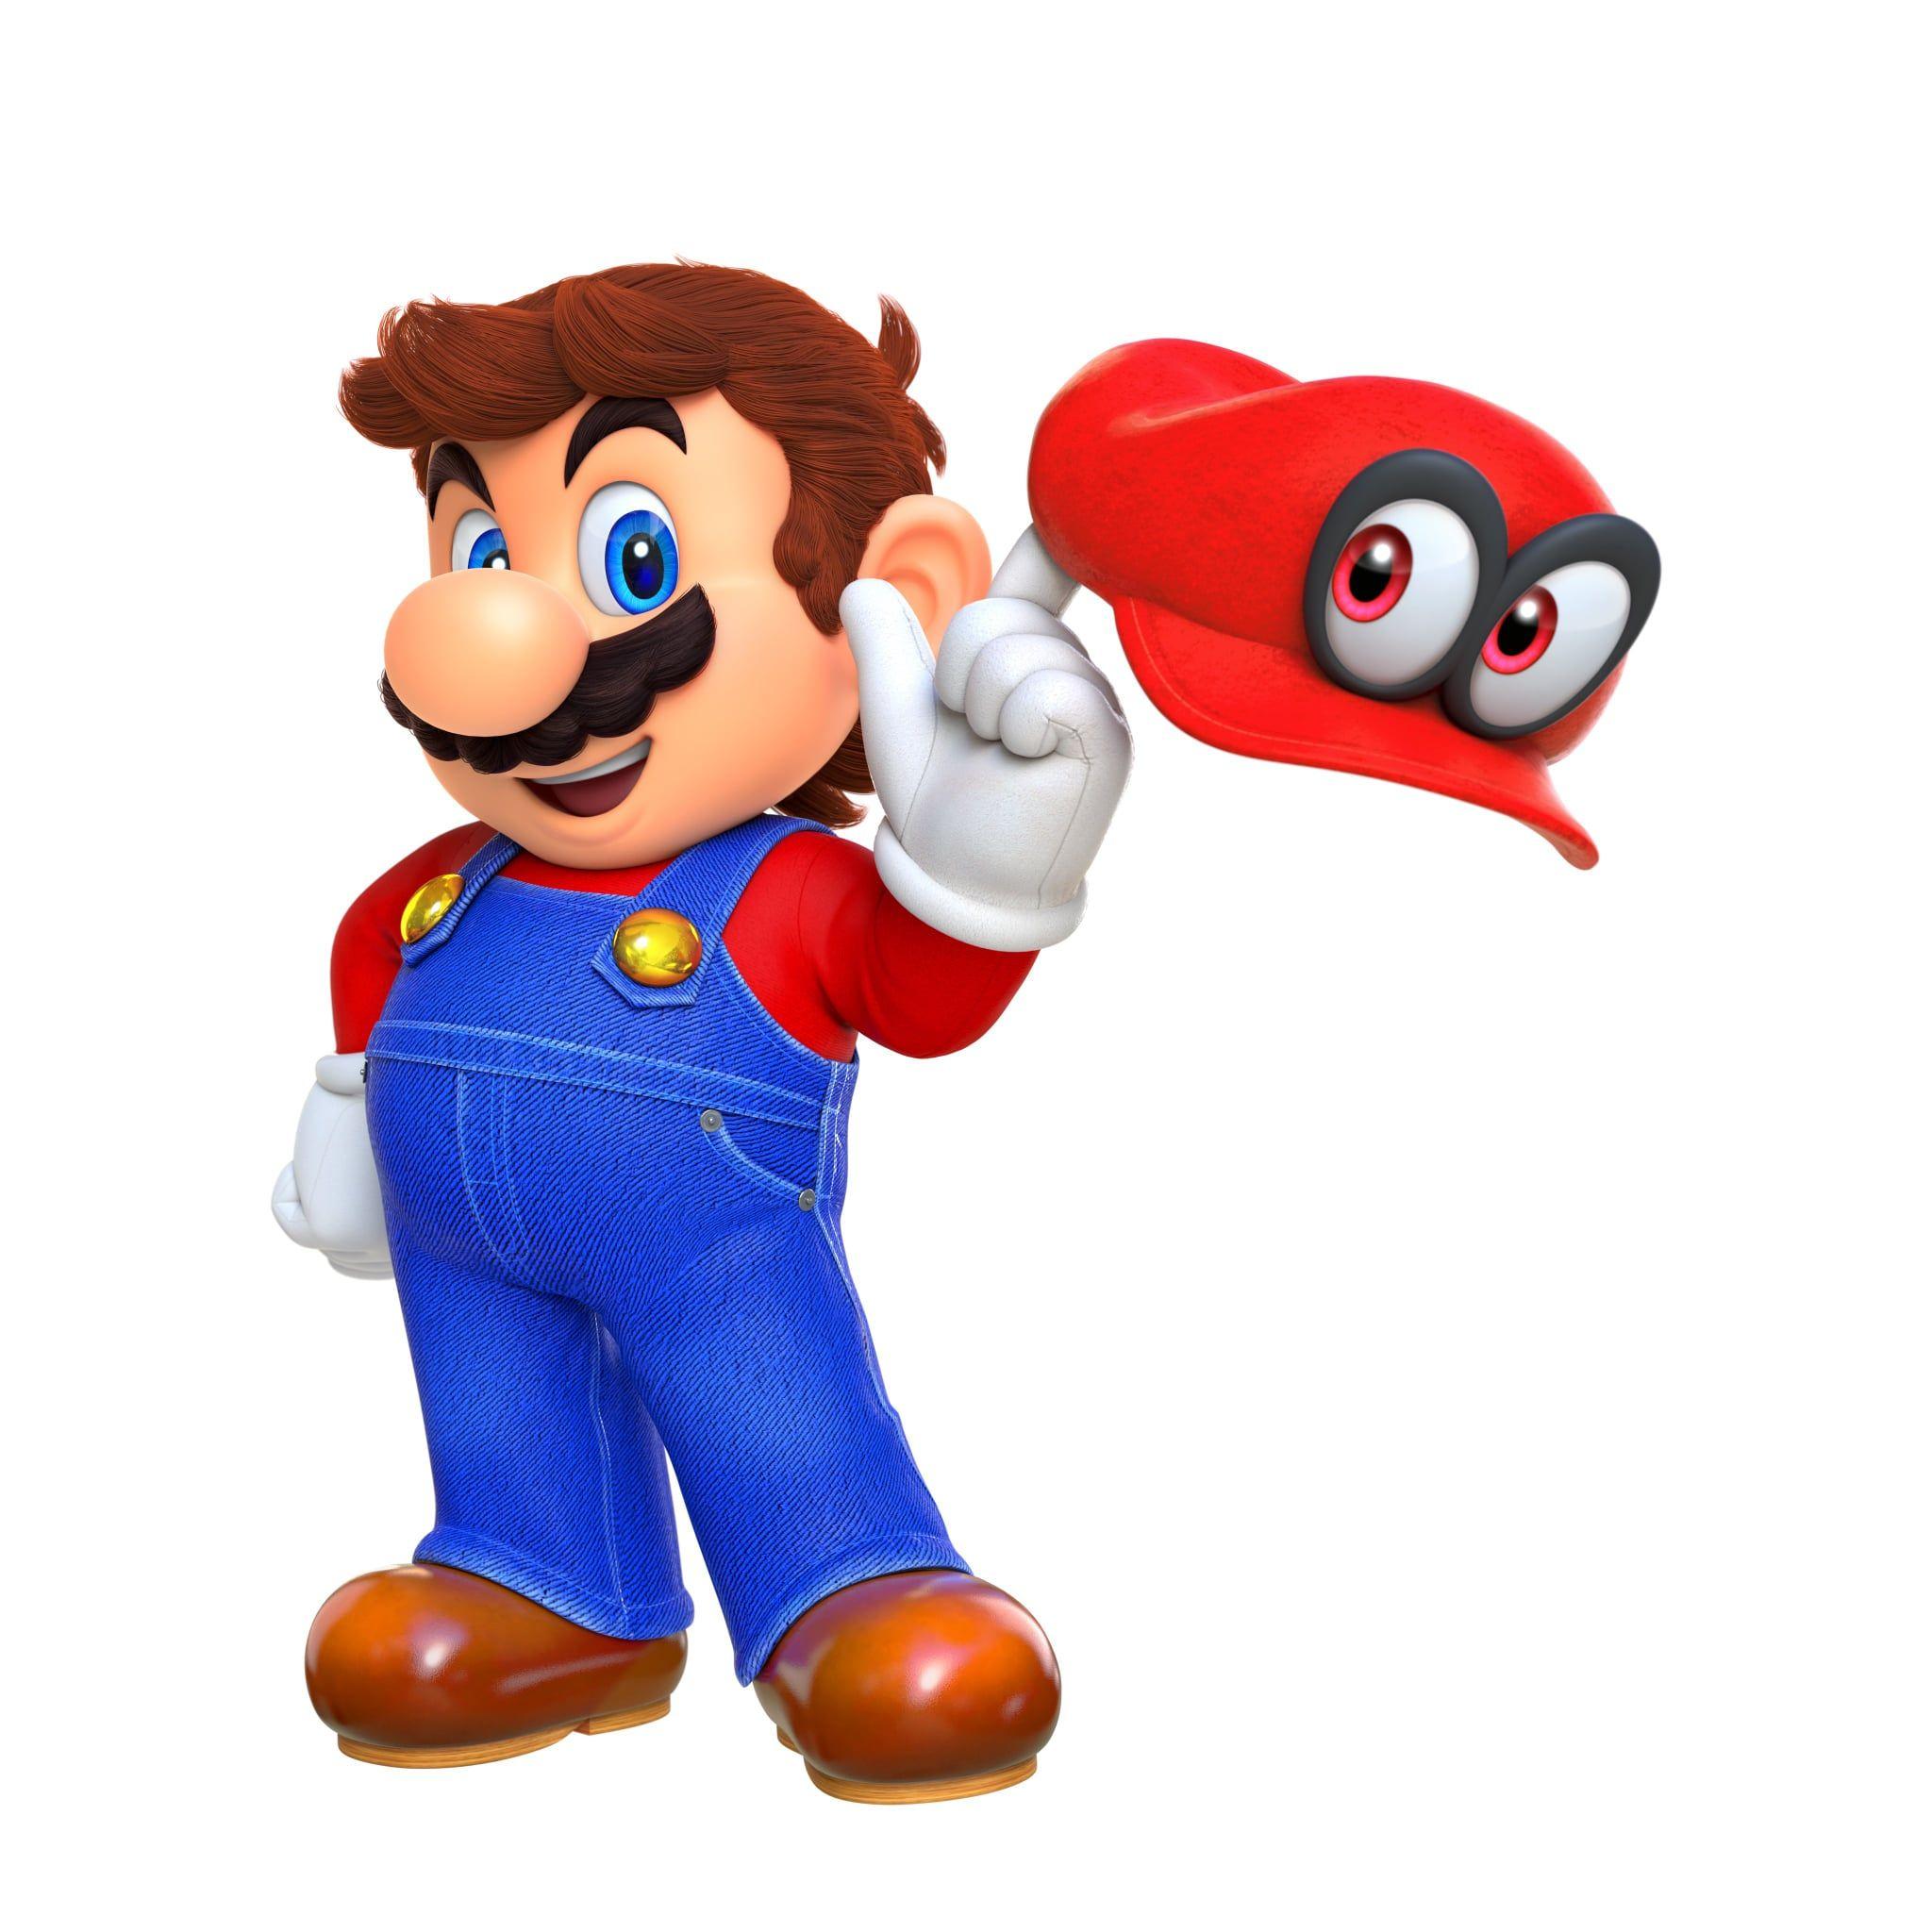 Nintendo S Super Mario Has Gray Hair And Is Now A Silver Fox Super Mario Mario Super Mario Bros